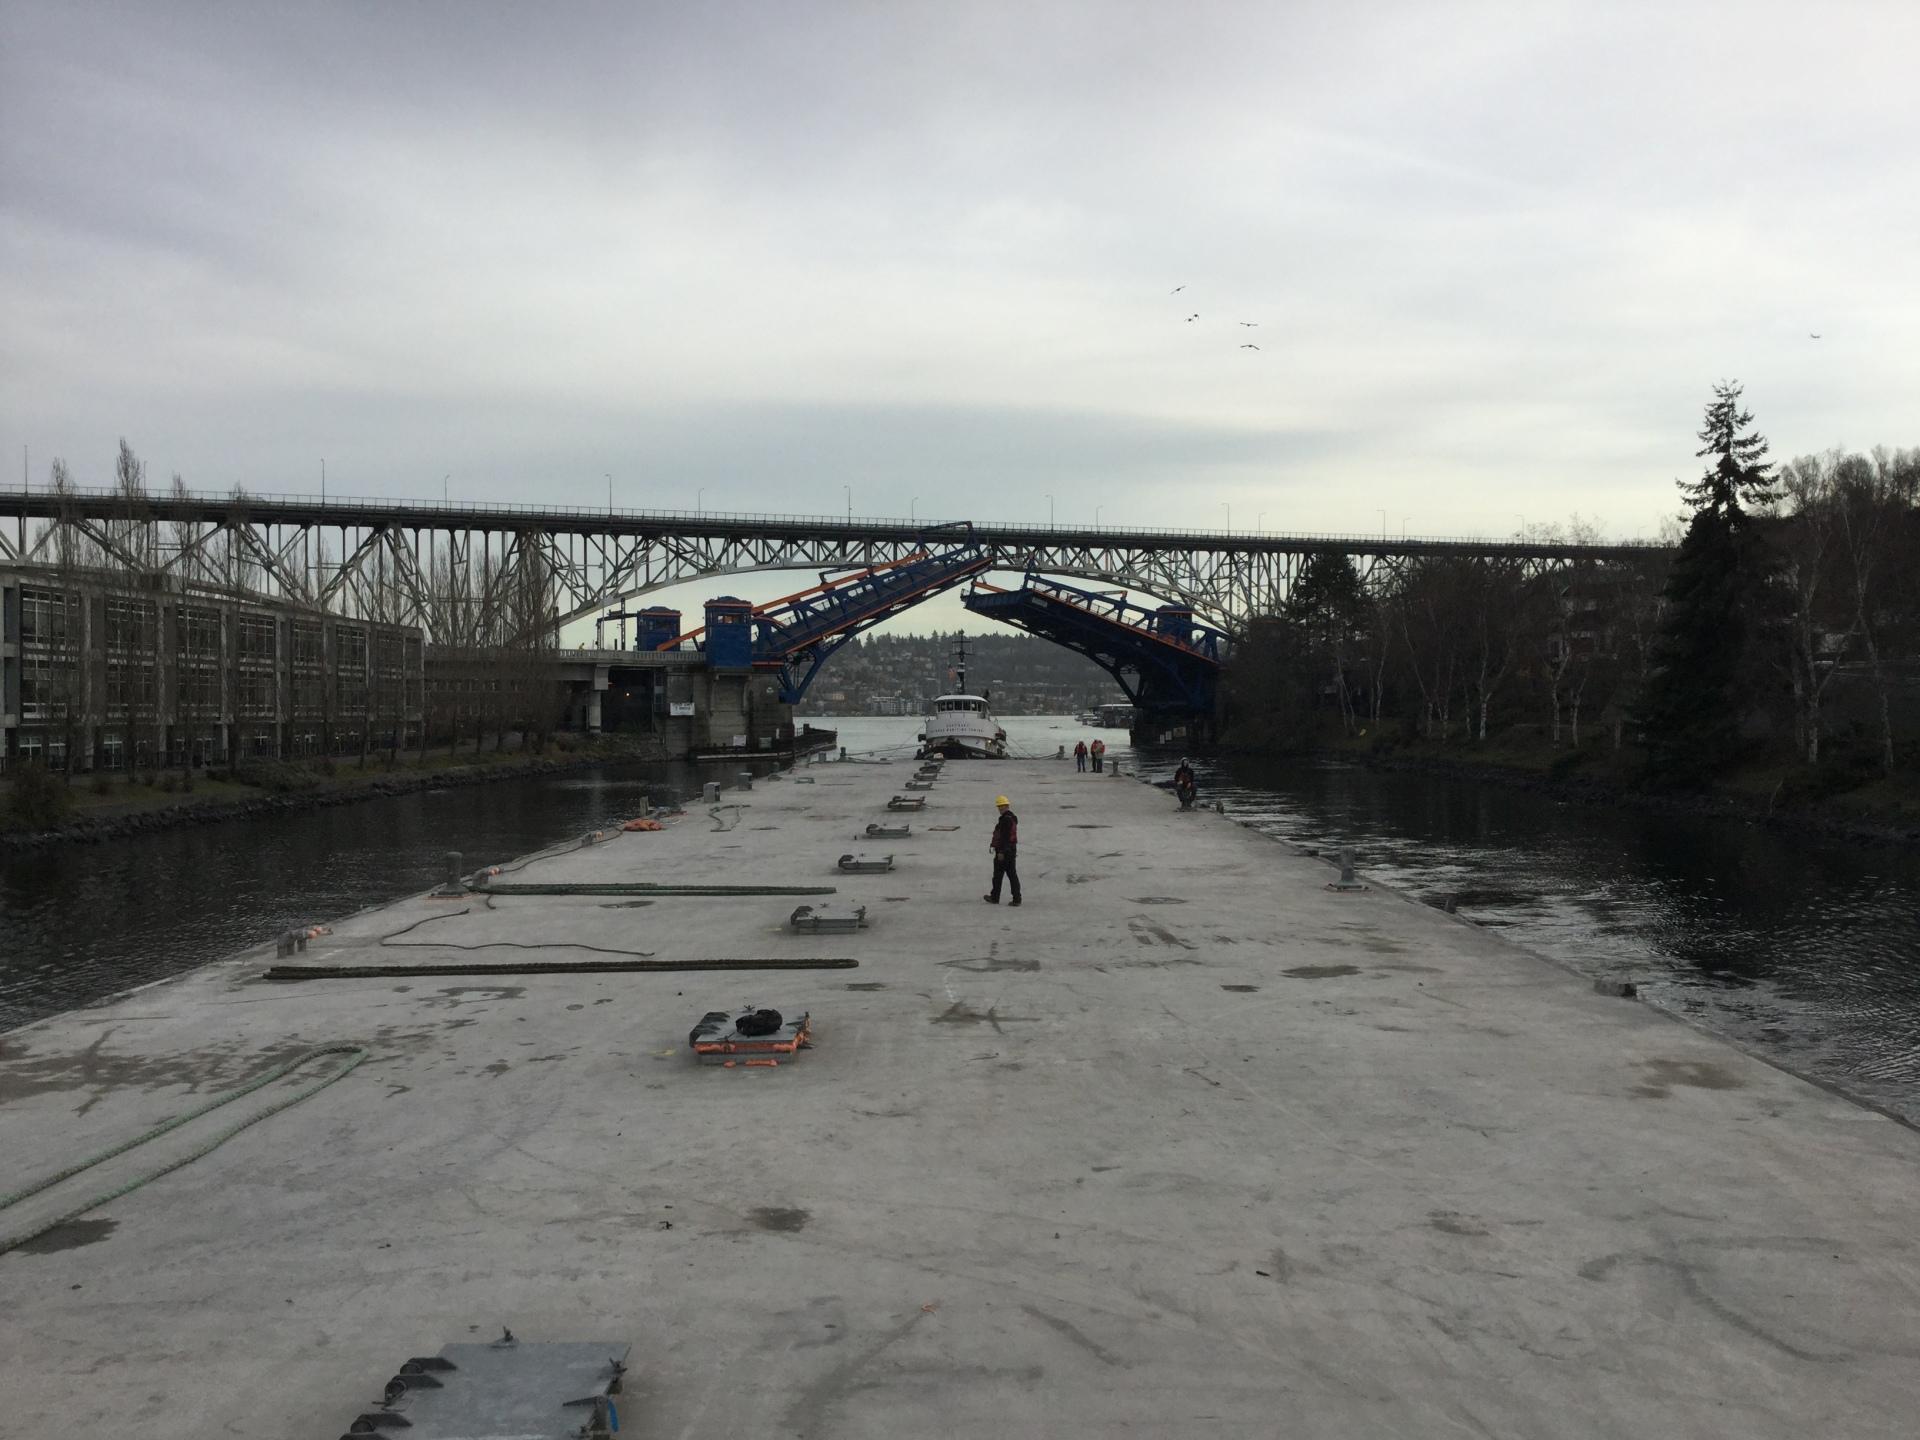 Pontoon leaves Lake Washington, part of the disassembly of the old 520 bridge.